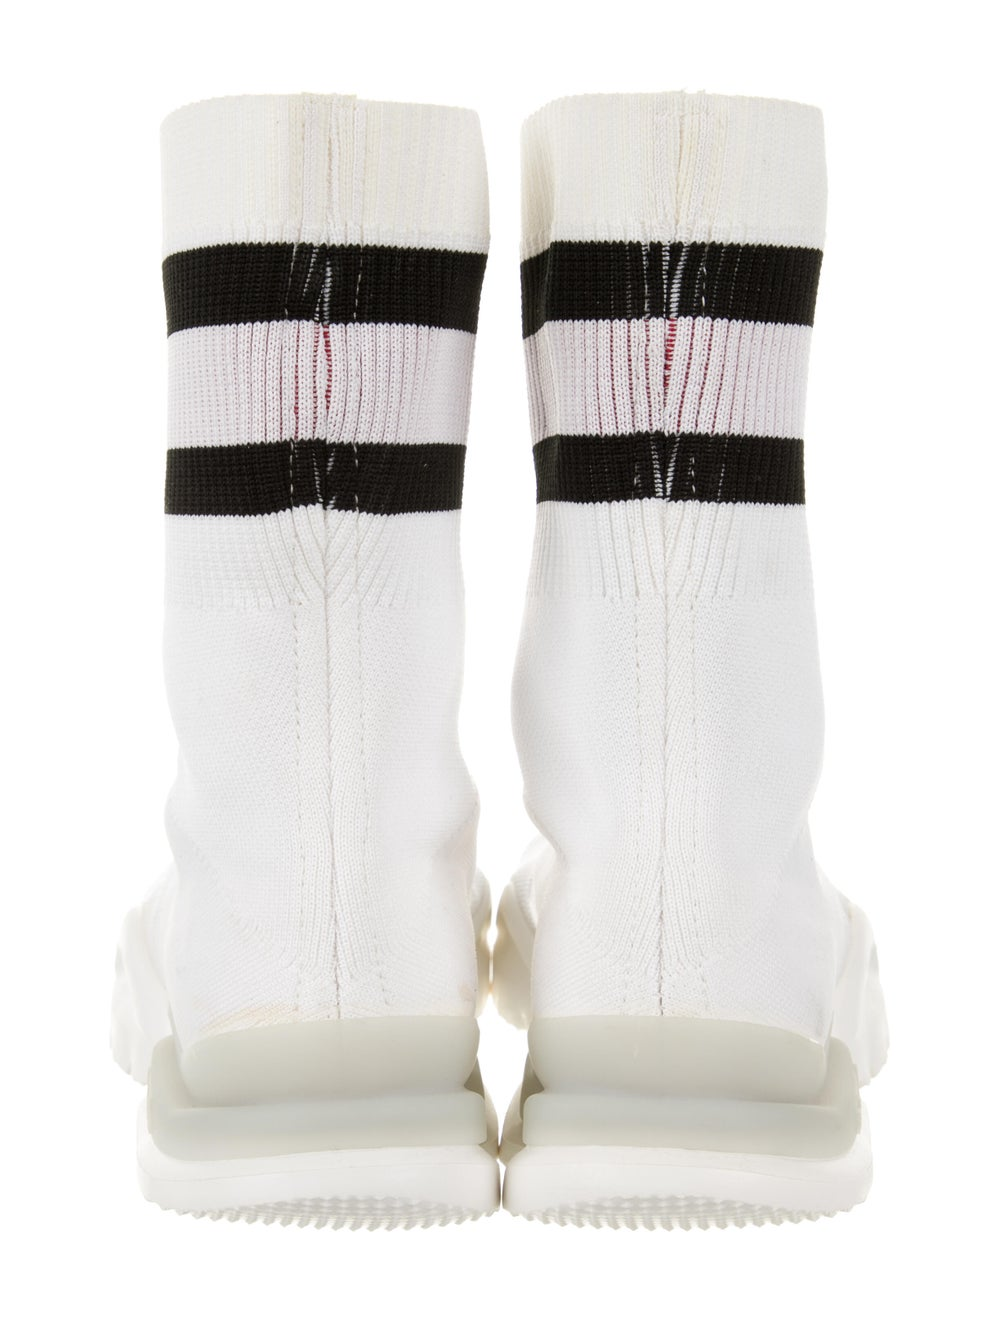 Vetements x Reebok Sock Pump Sock Sneakers White - image 4